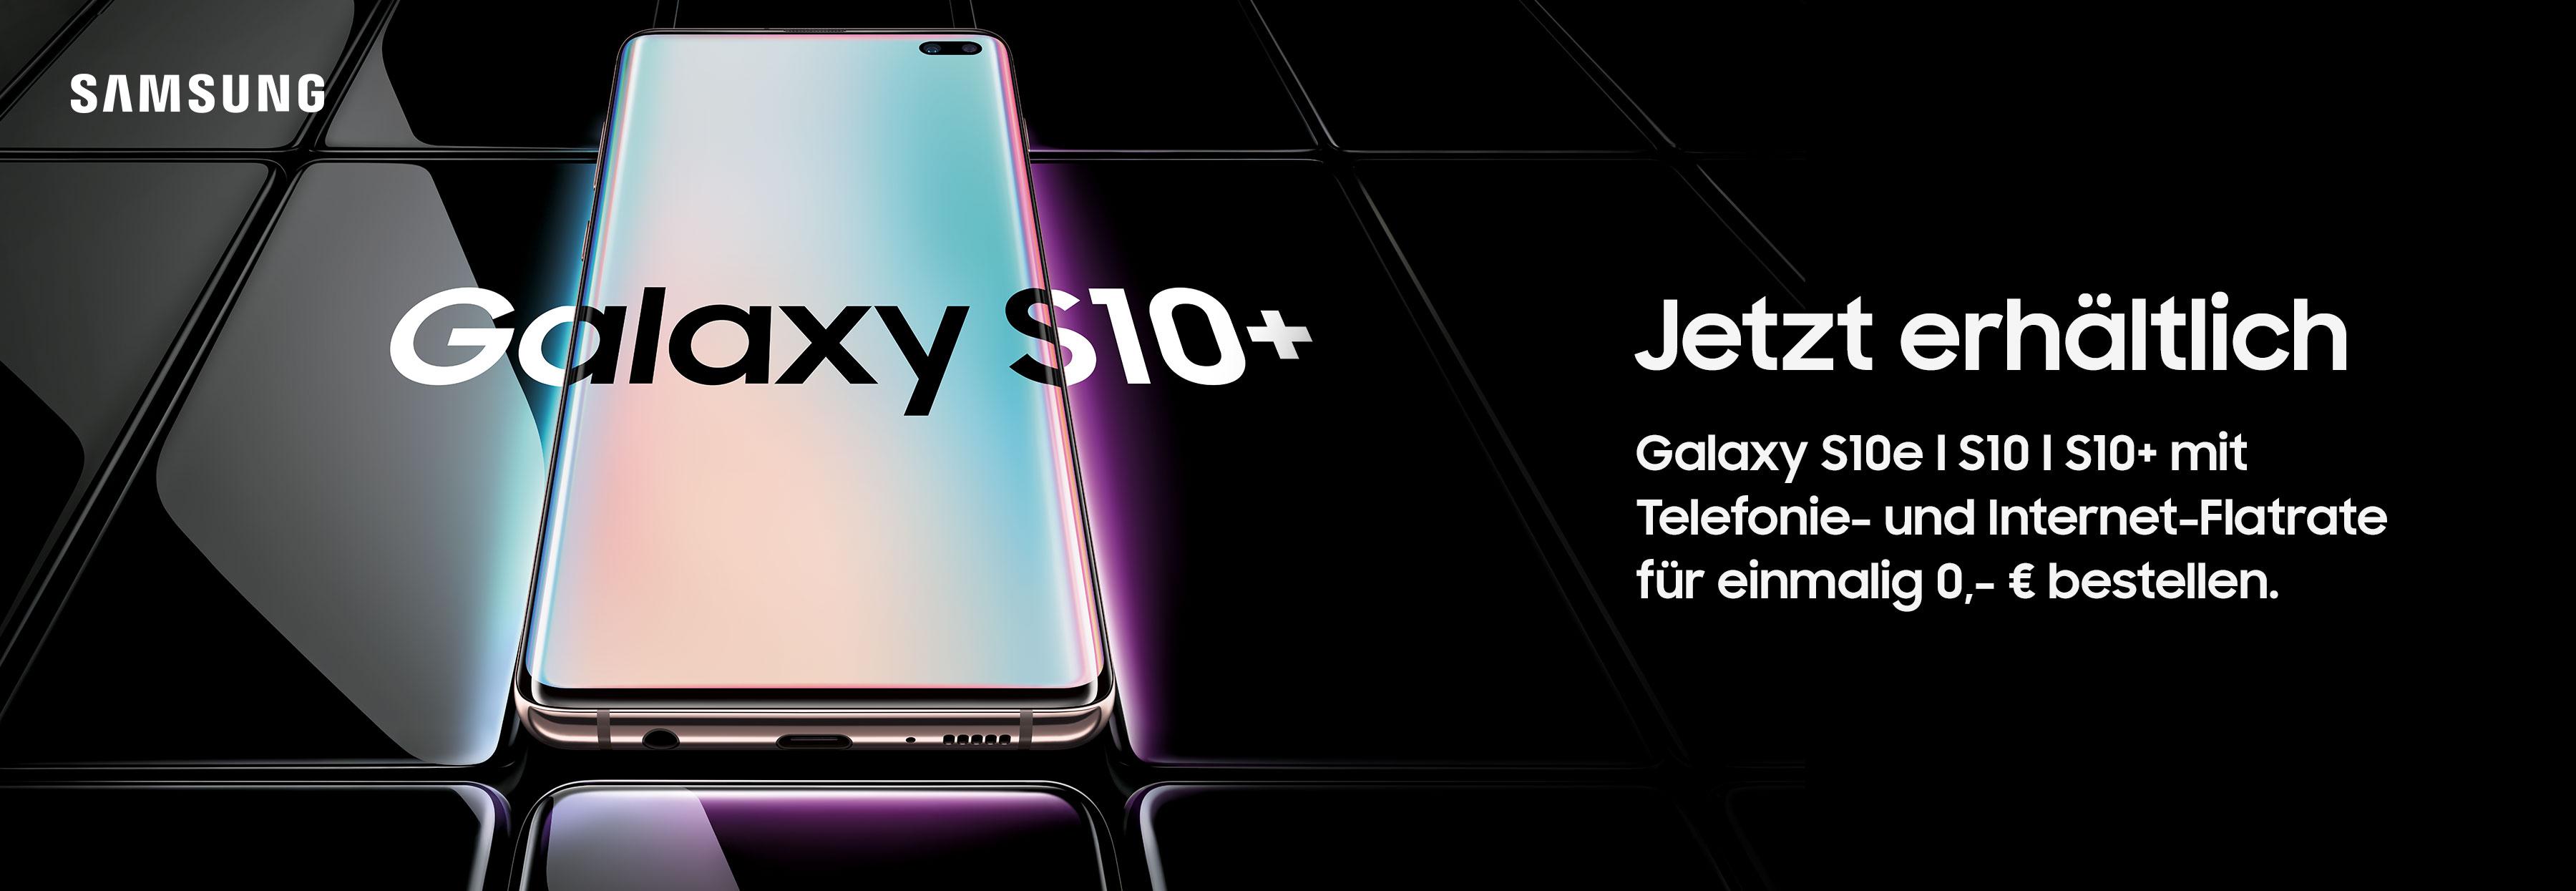 Neues Samsung Galaxy S10